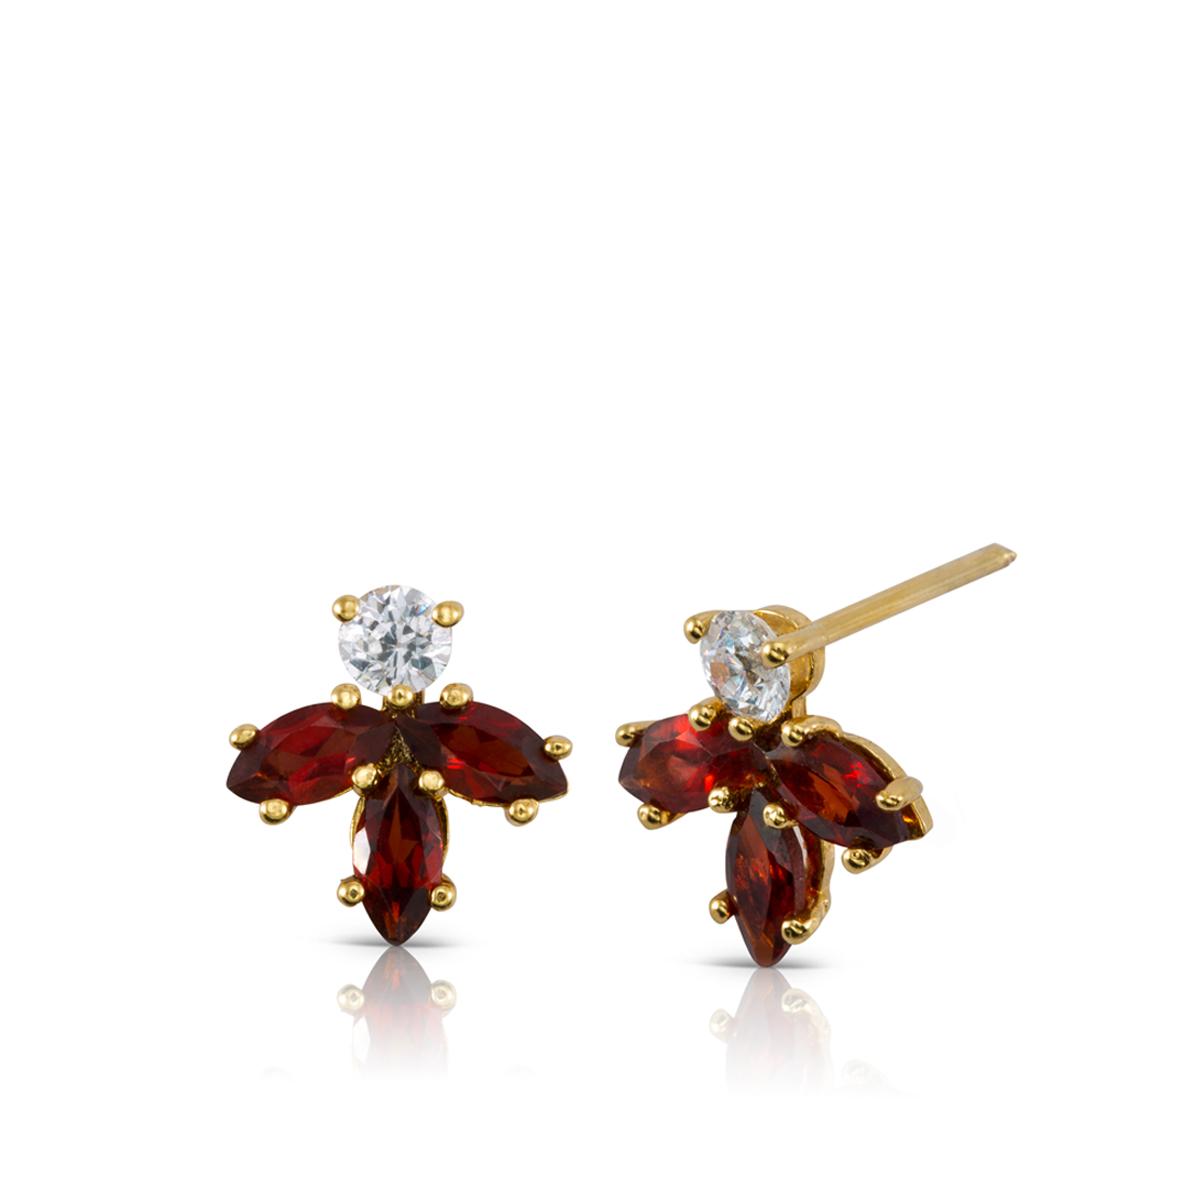 Gold Garnets and Diamonds stud earrings